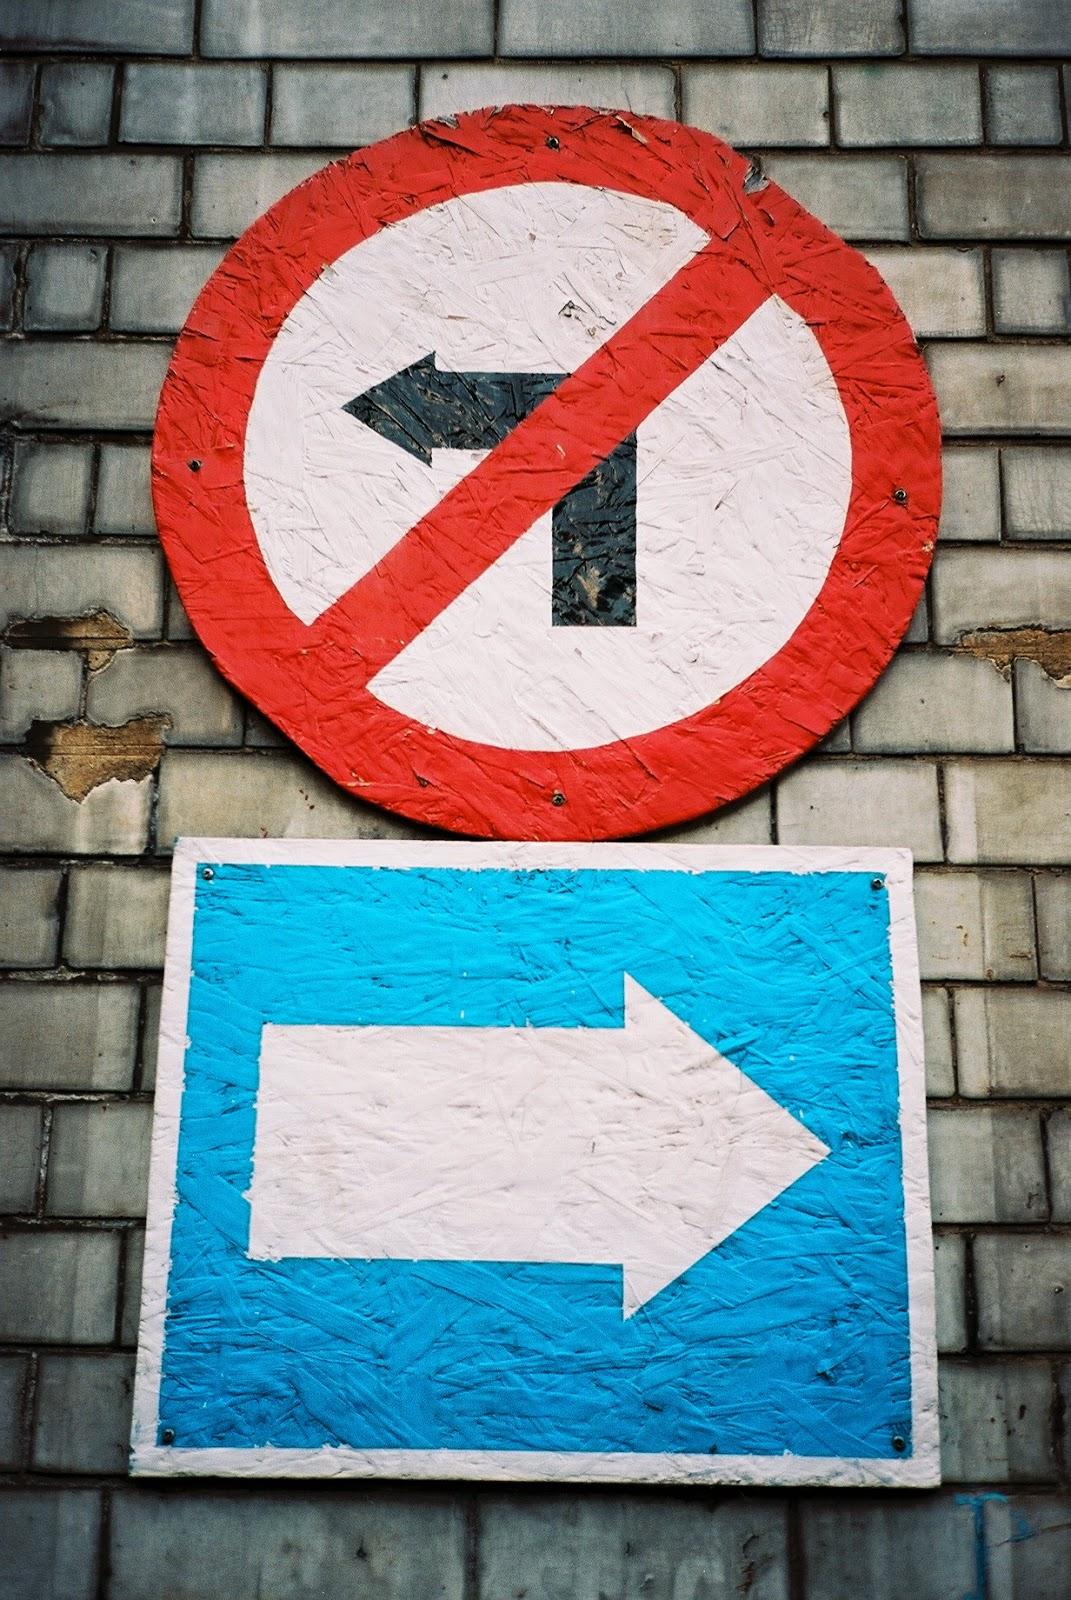 HIGHWAY CODE, ONE WAY STREET, NO LEFT TURN, HAND PAINTED SIGNS, FOLK ART, 2015 GENERAL ELECTION,  LAMBETH NORTH, LONDON © VAC 100 DAYS 4 MILLION CONVERSATIONS